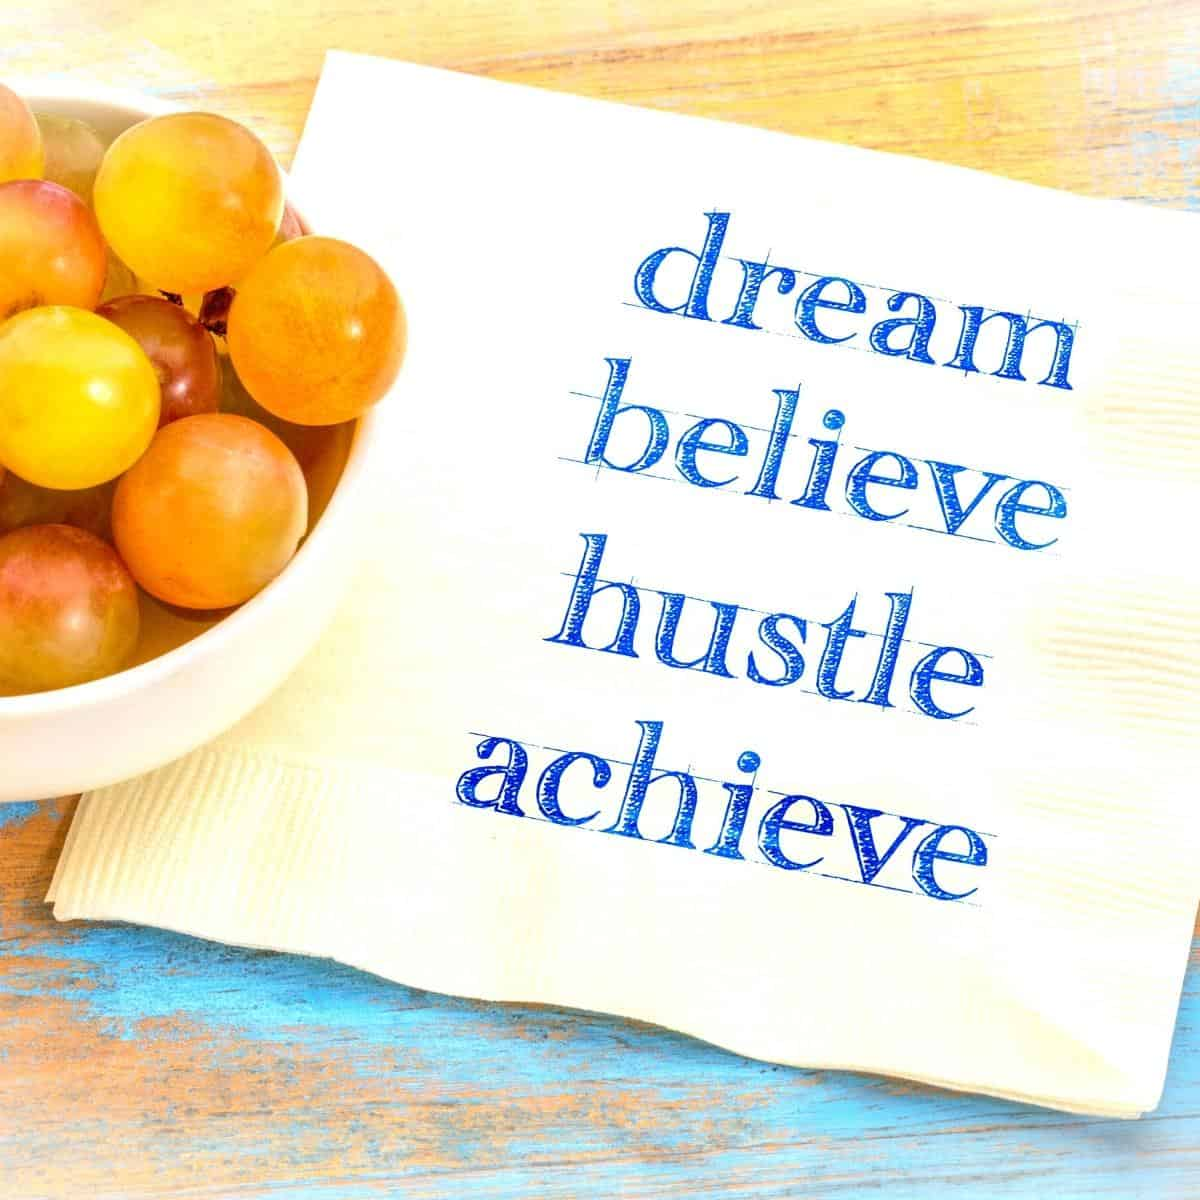 Hustle Culture and Burnout